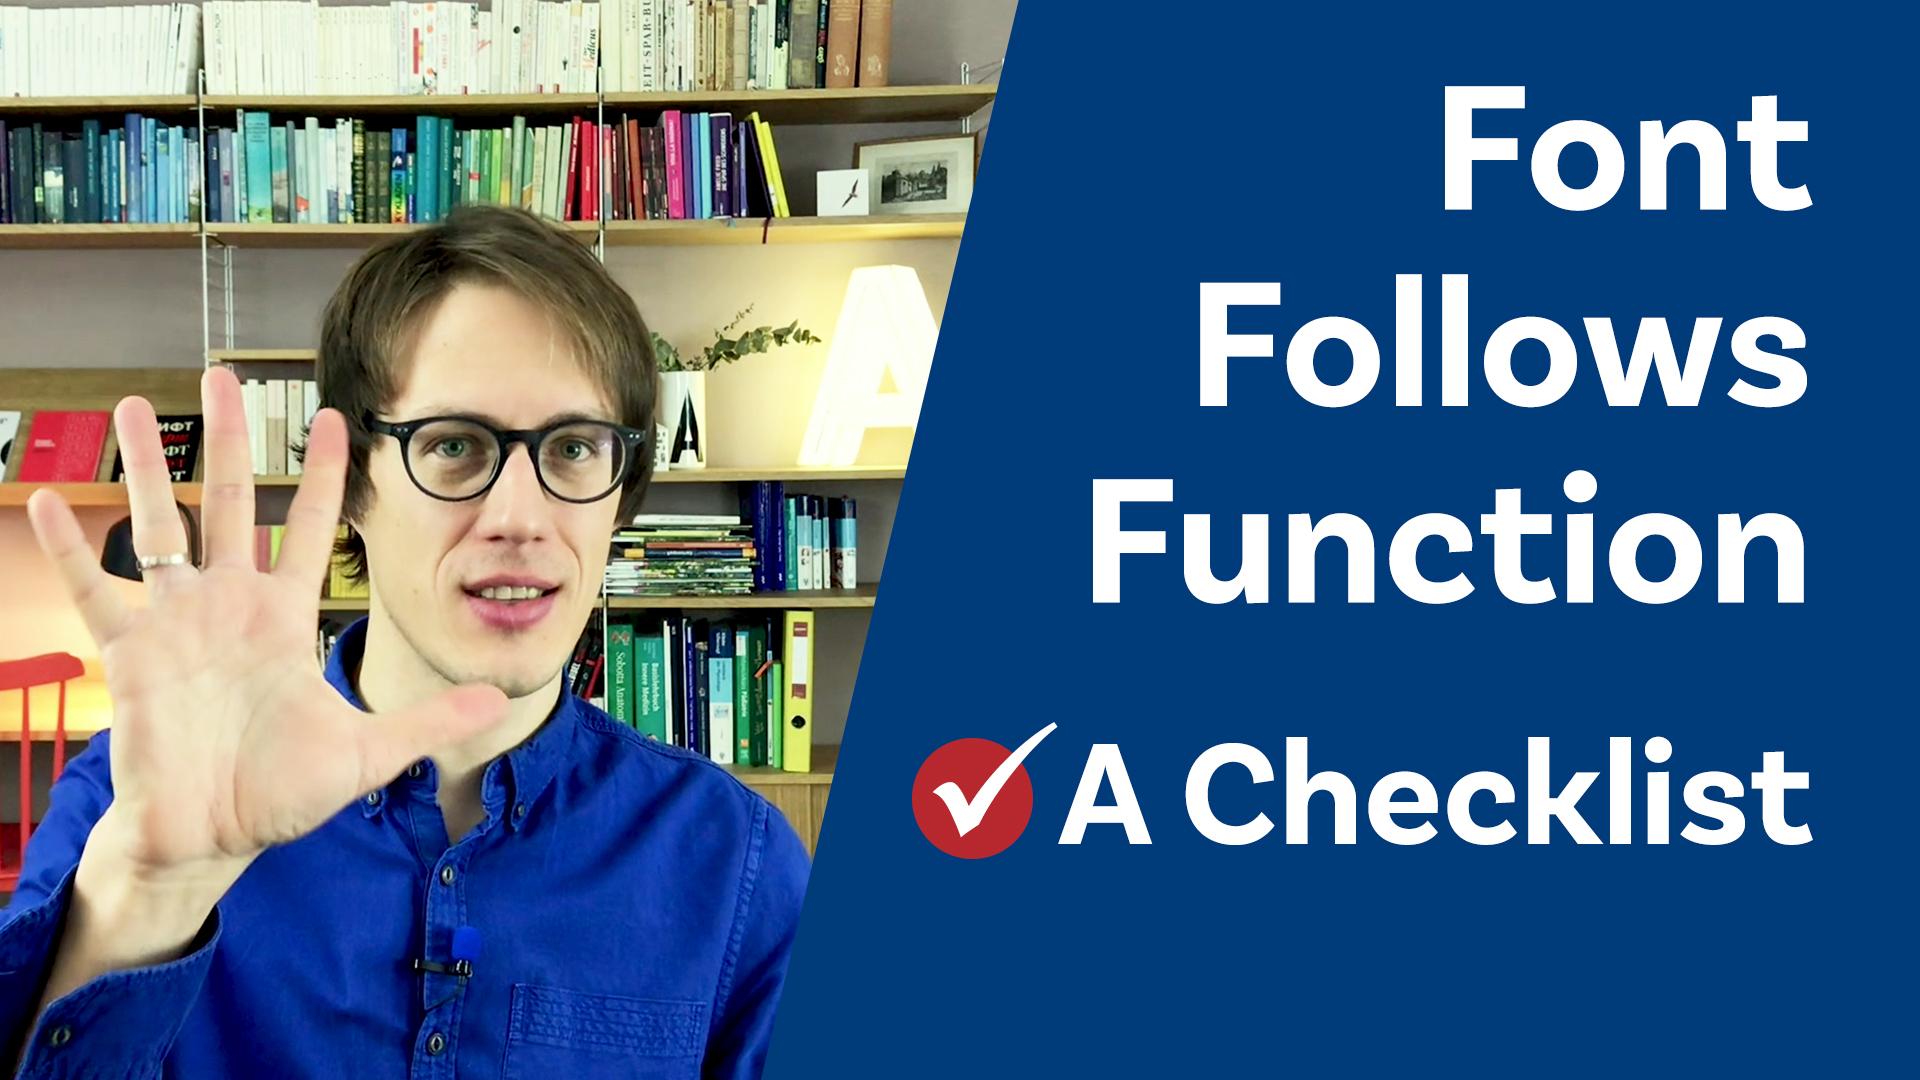 Font follows function, a checklist